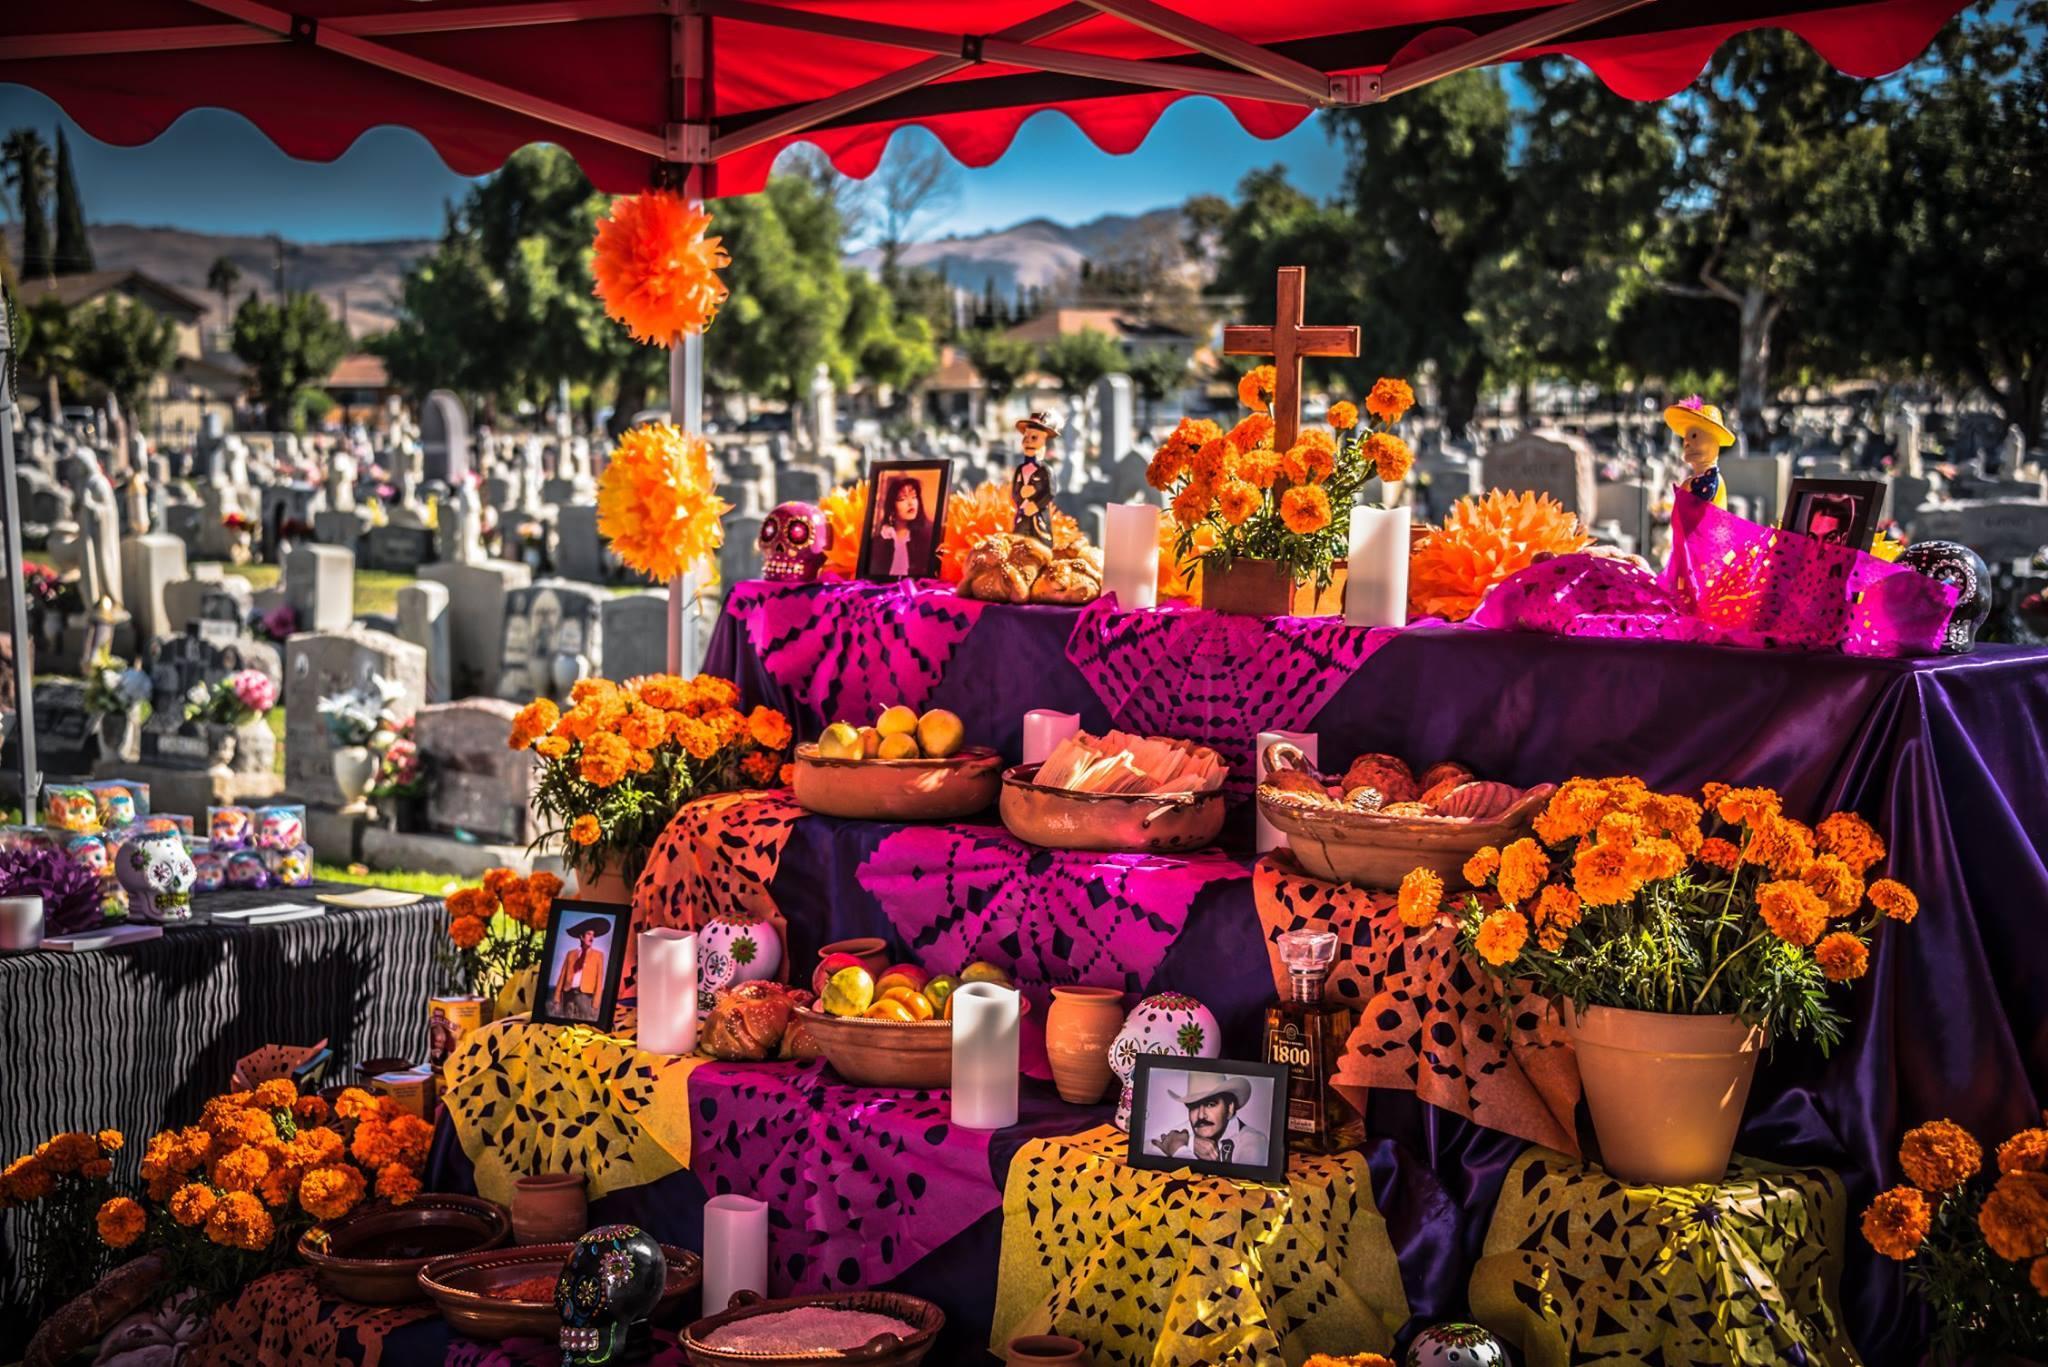 5th-annual-dia-de-los-muertos-calvary-cemetery-san-jose-2.jpg